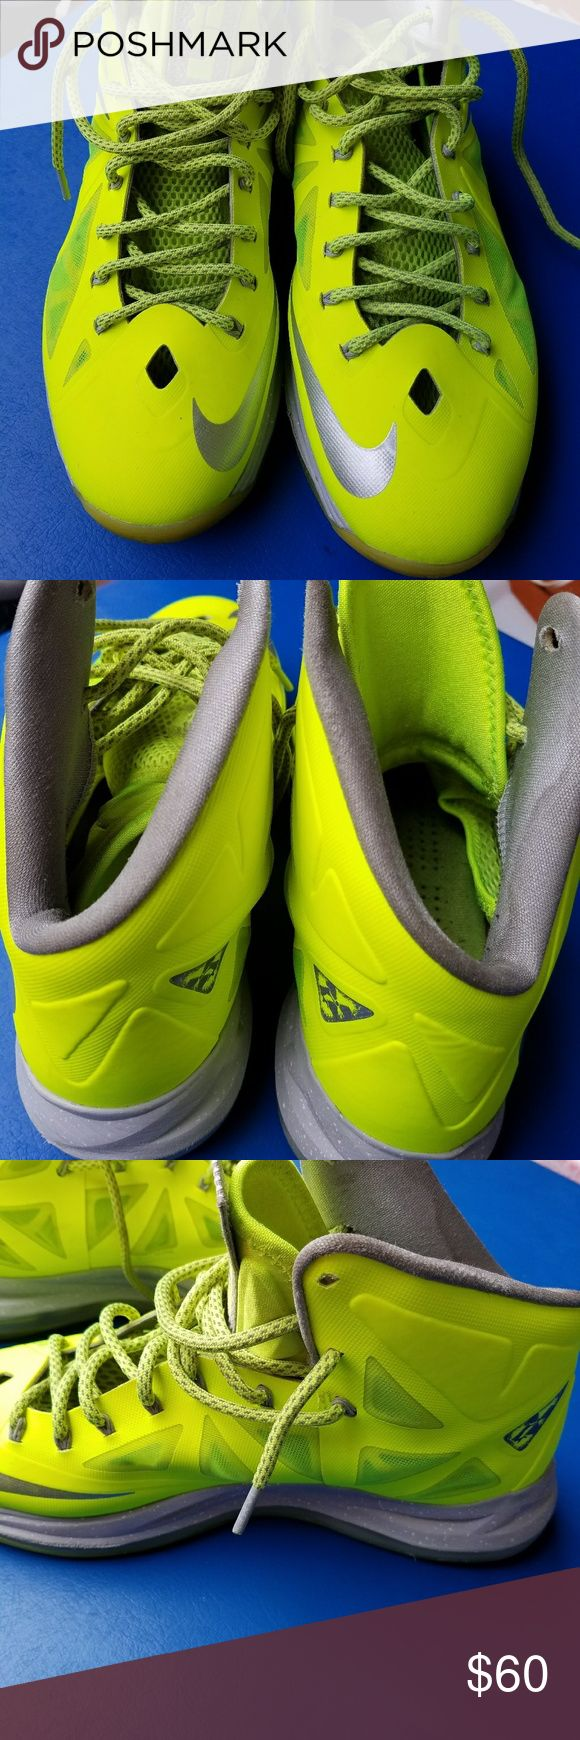 Nike LeBron James Nike LeBron James size 10 Nike Shoes